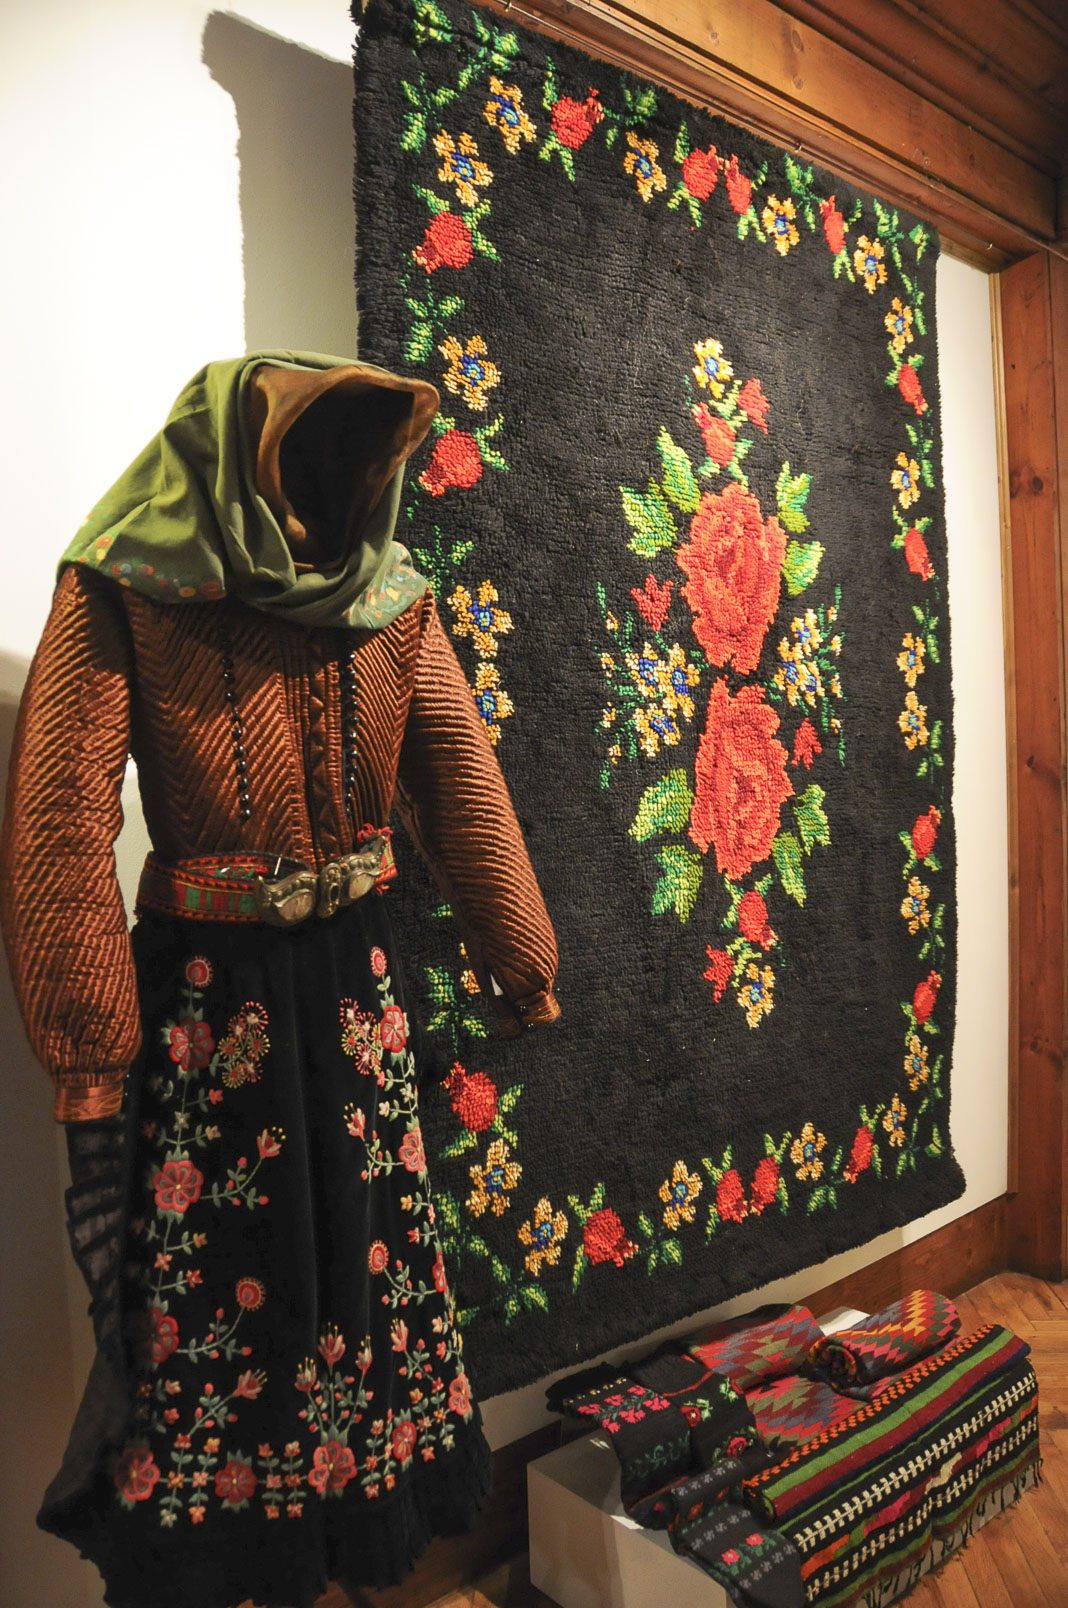 troyan-museum-cvetqta-na-zografa-14